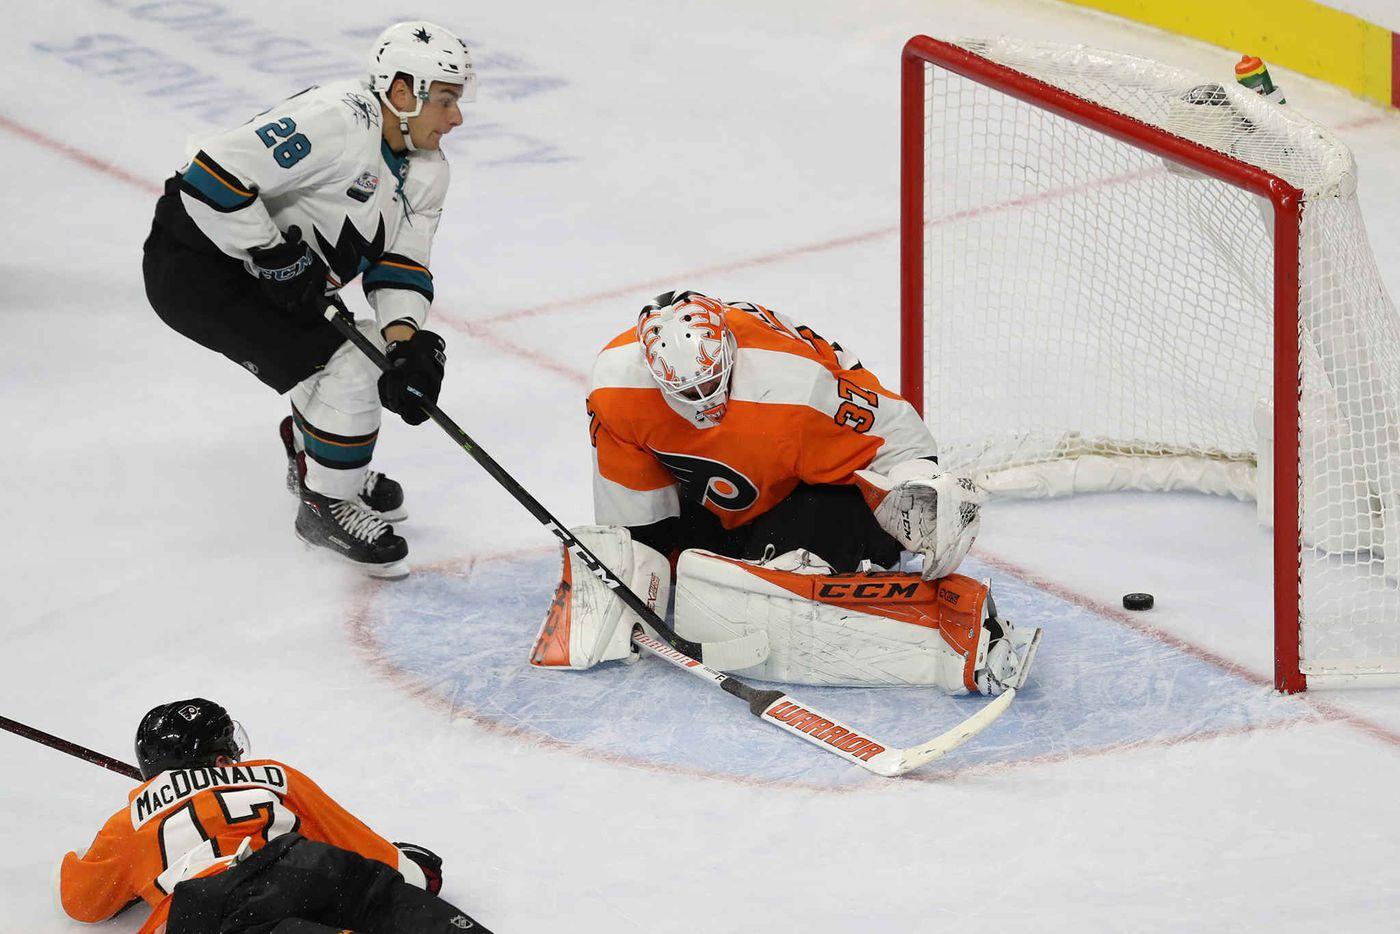 25c9ea8d16d San Jose Sharks Timo Meier scores between the legs of Flyers goalie Brian  Elliott Tuesday,